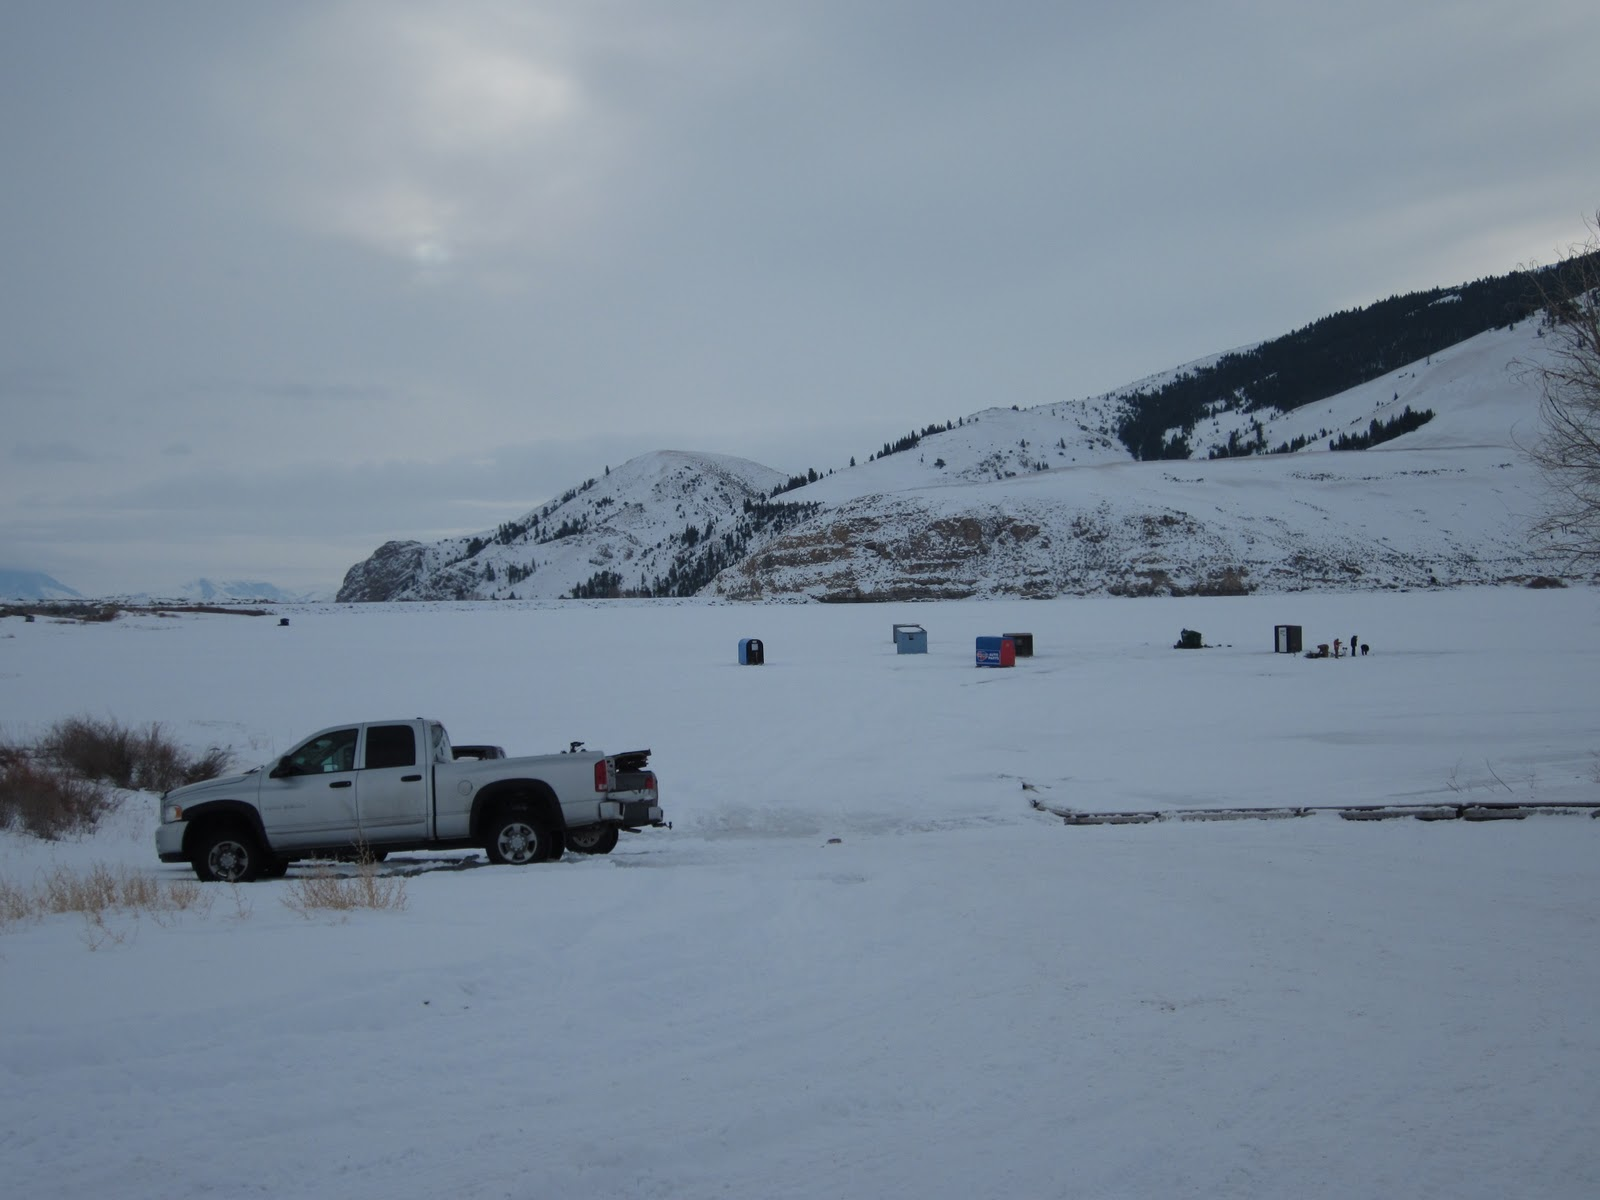 Mackay idaho 83251 mackay dam ice fishing december 26 2010 for Ice fishing idaho